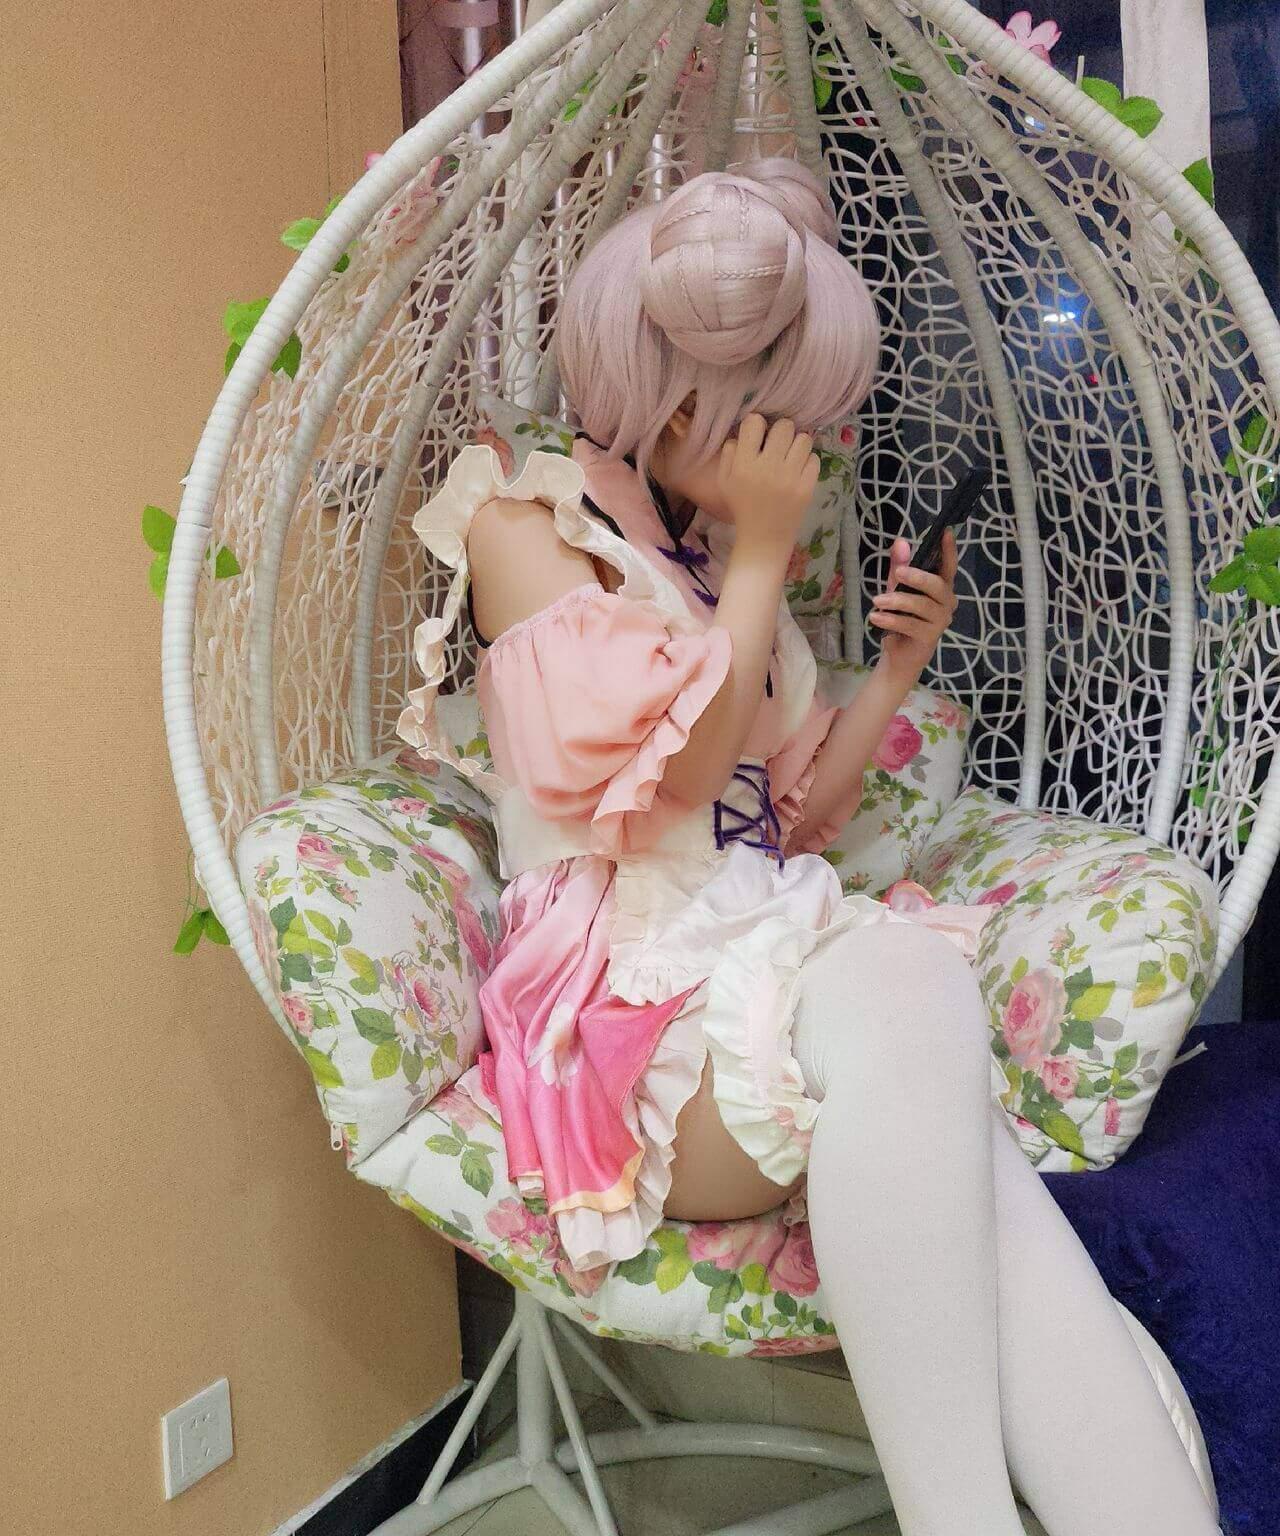 【Cosplay】【甜美小娇妾沈娇娇】 王者荣耀 小乔【120】 COS-第4张